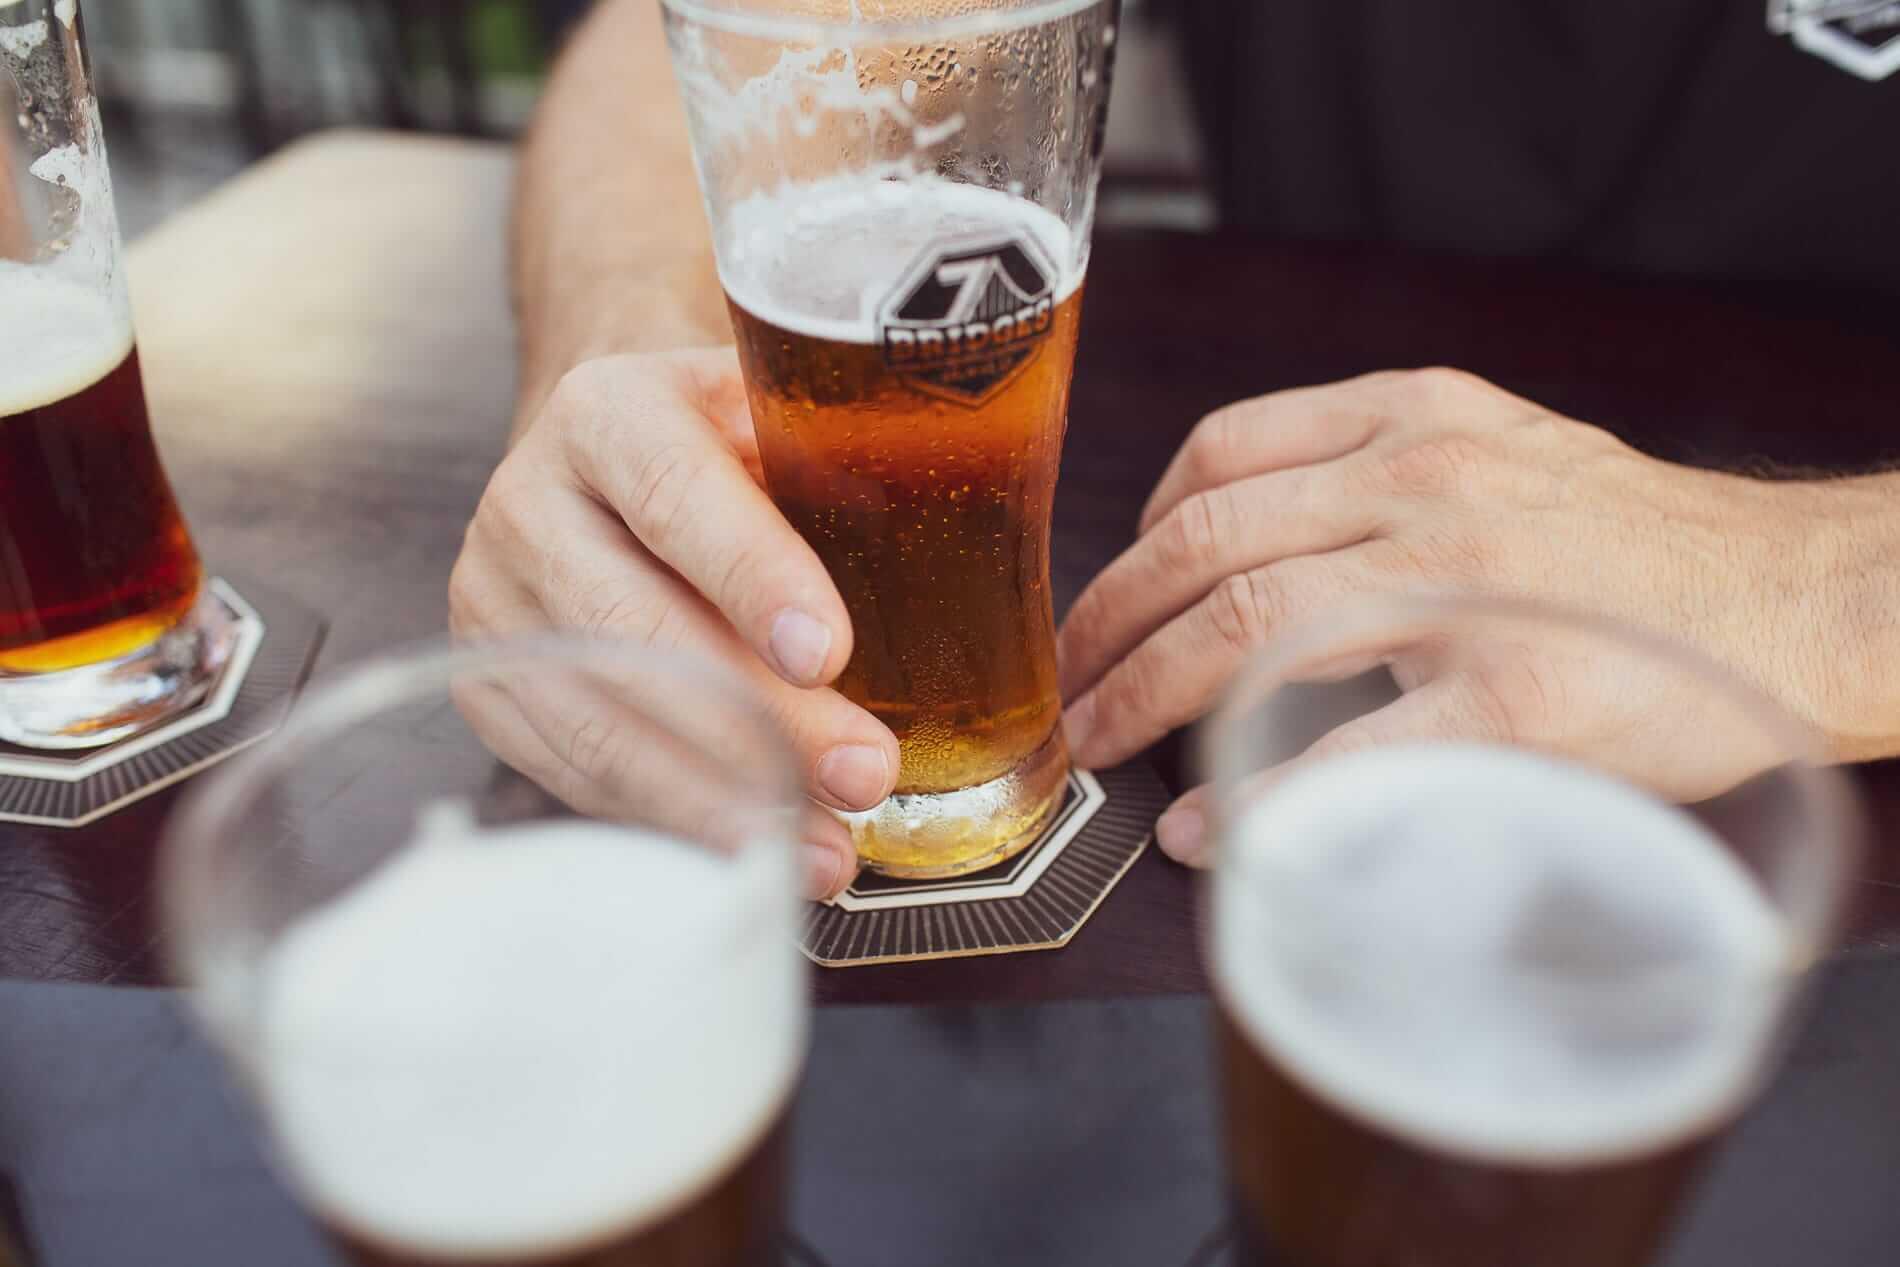 7 Bridges craft beers - Craft Beer in Hoi An